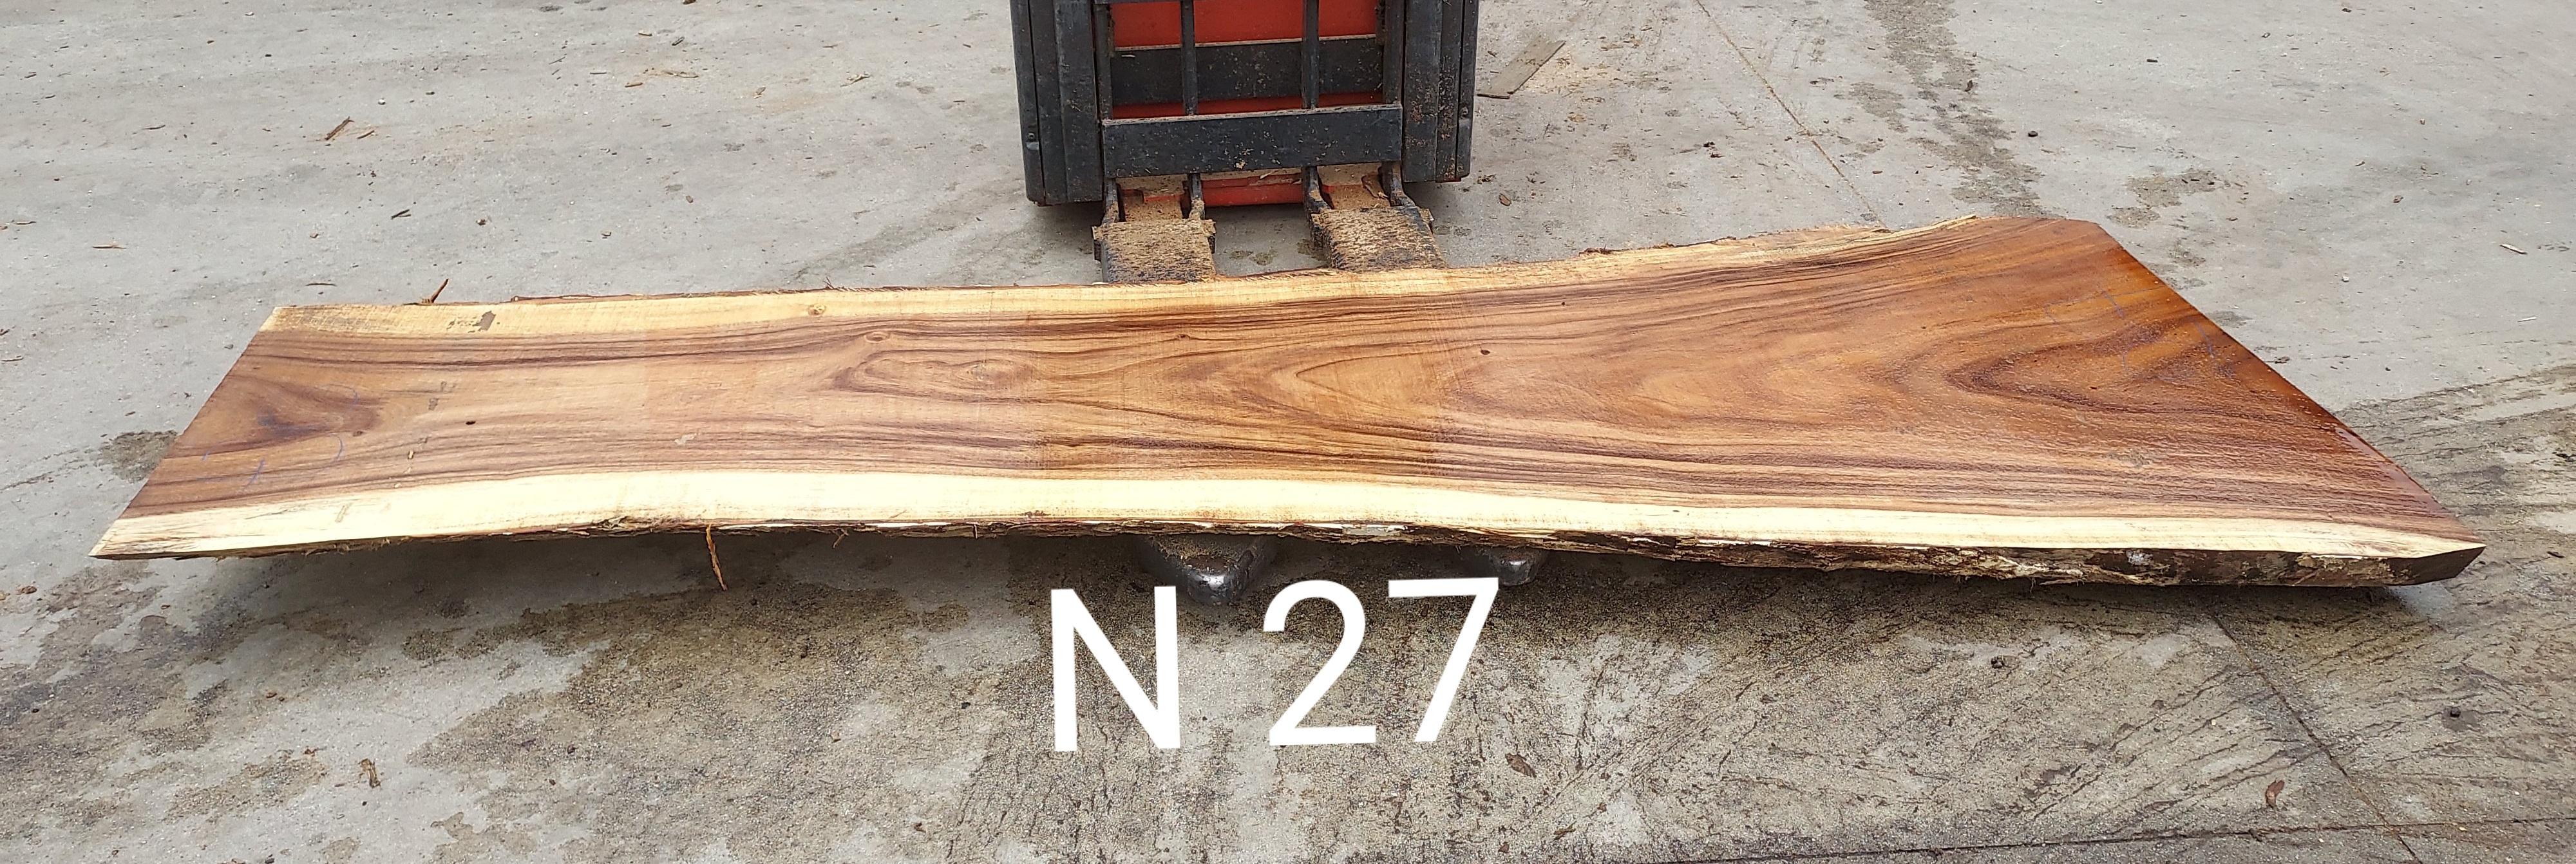 N 27 ANCHO